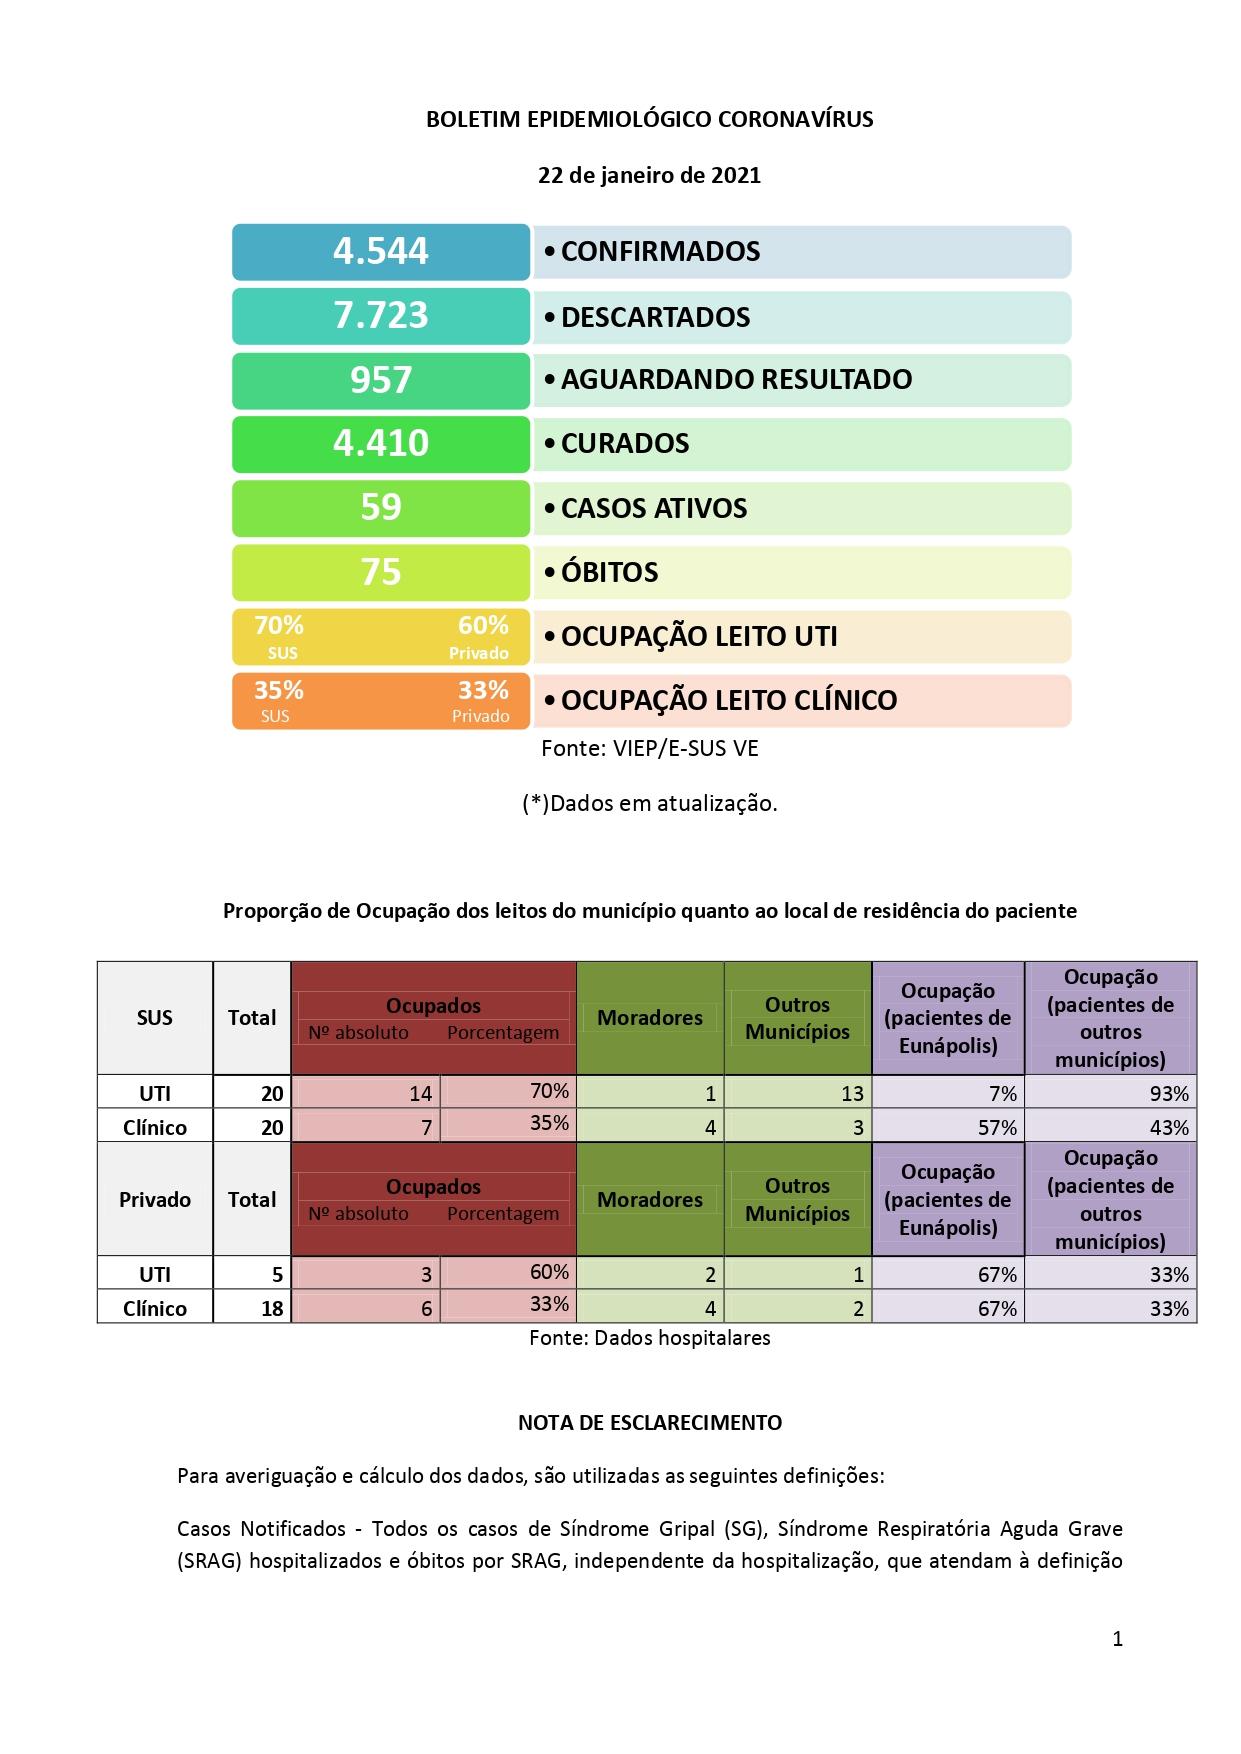 Boletim Epidemiológico Coronavírus desta sexta-feira (22) em Eunápolis 20